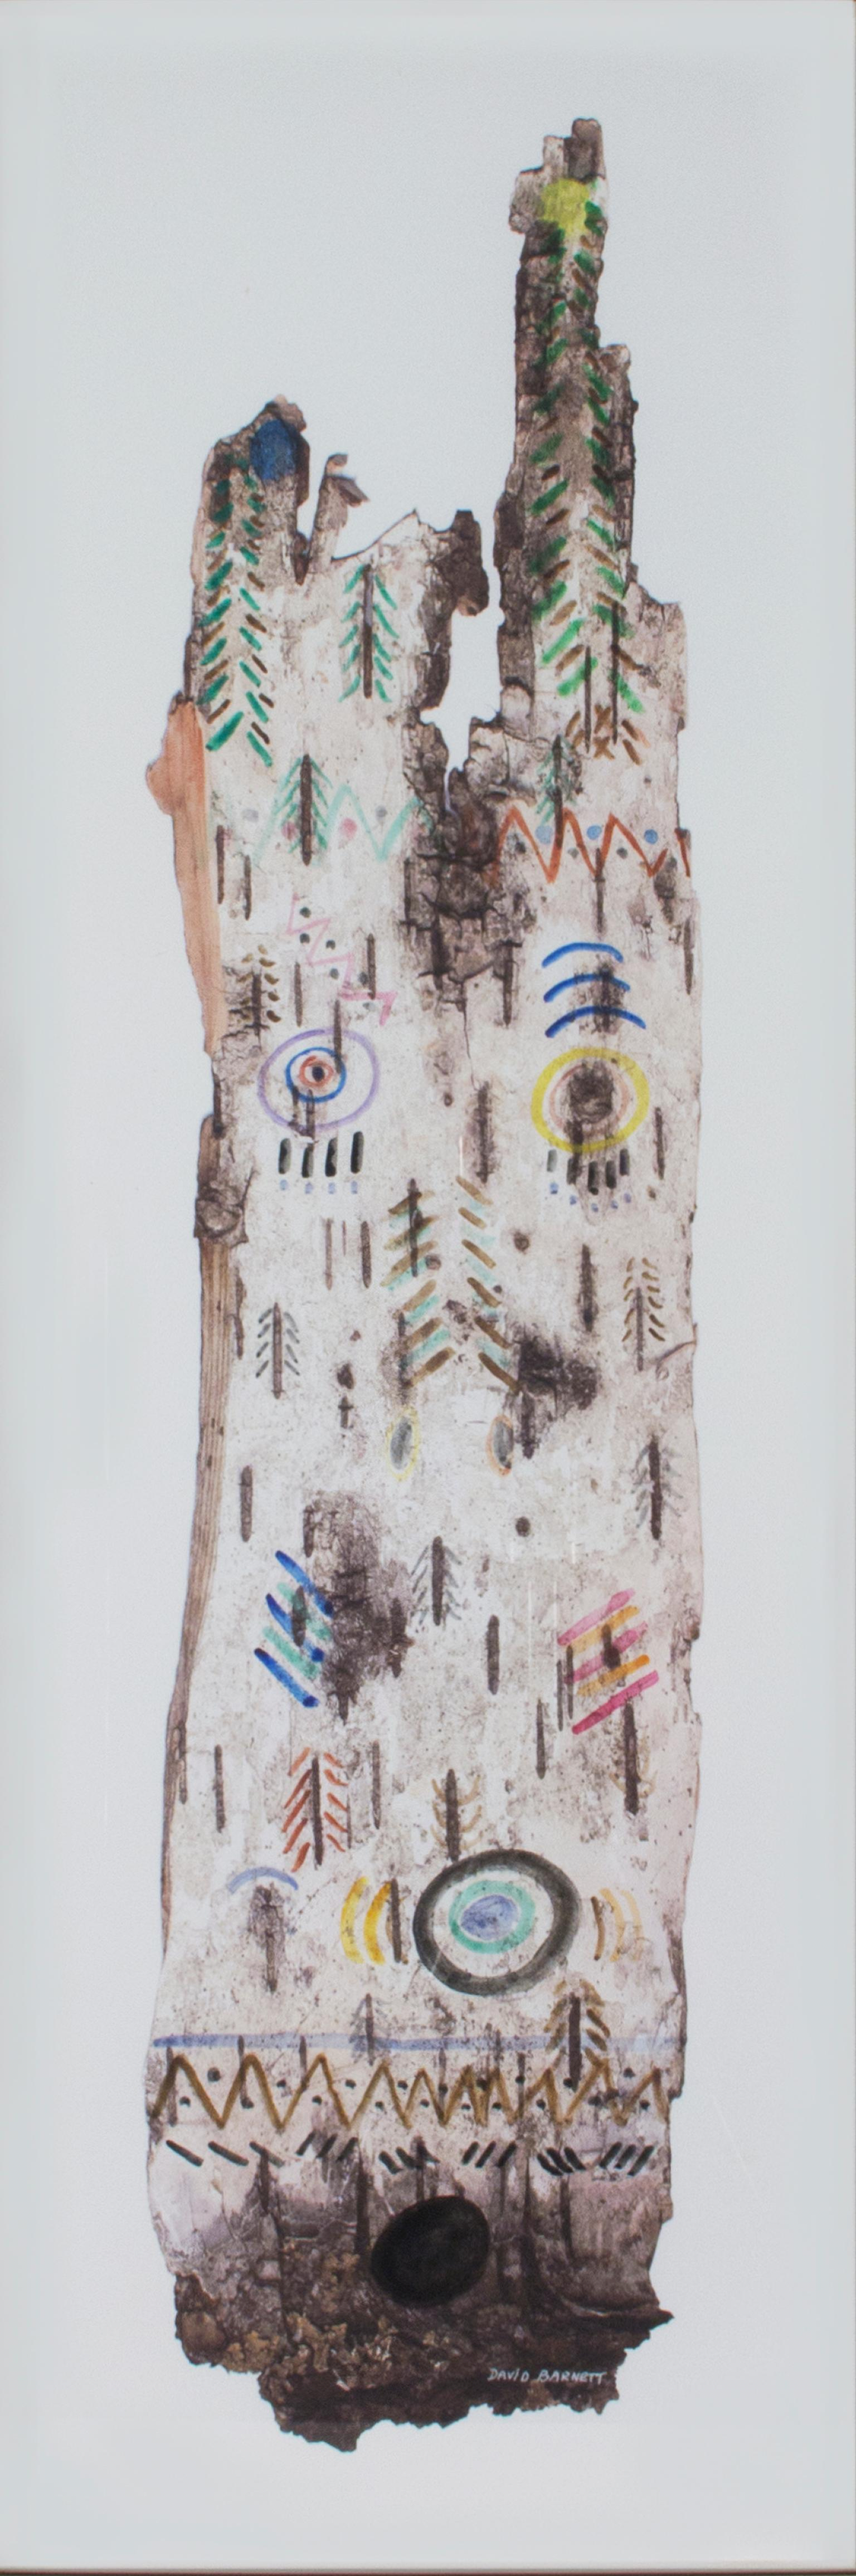 """Up North Birch Bark Series: Tree Spirit Chief,"" Mixed Media by David Barnett"